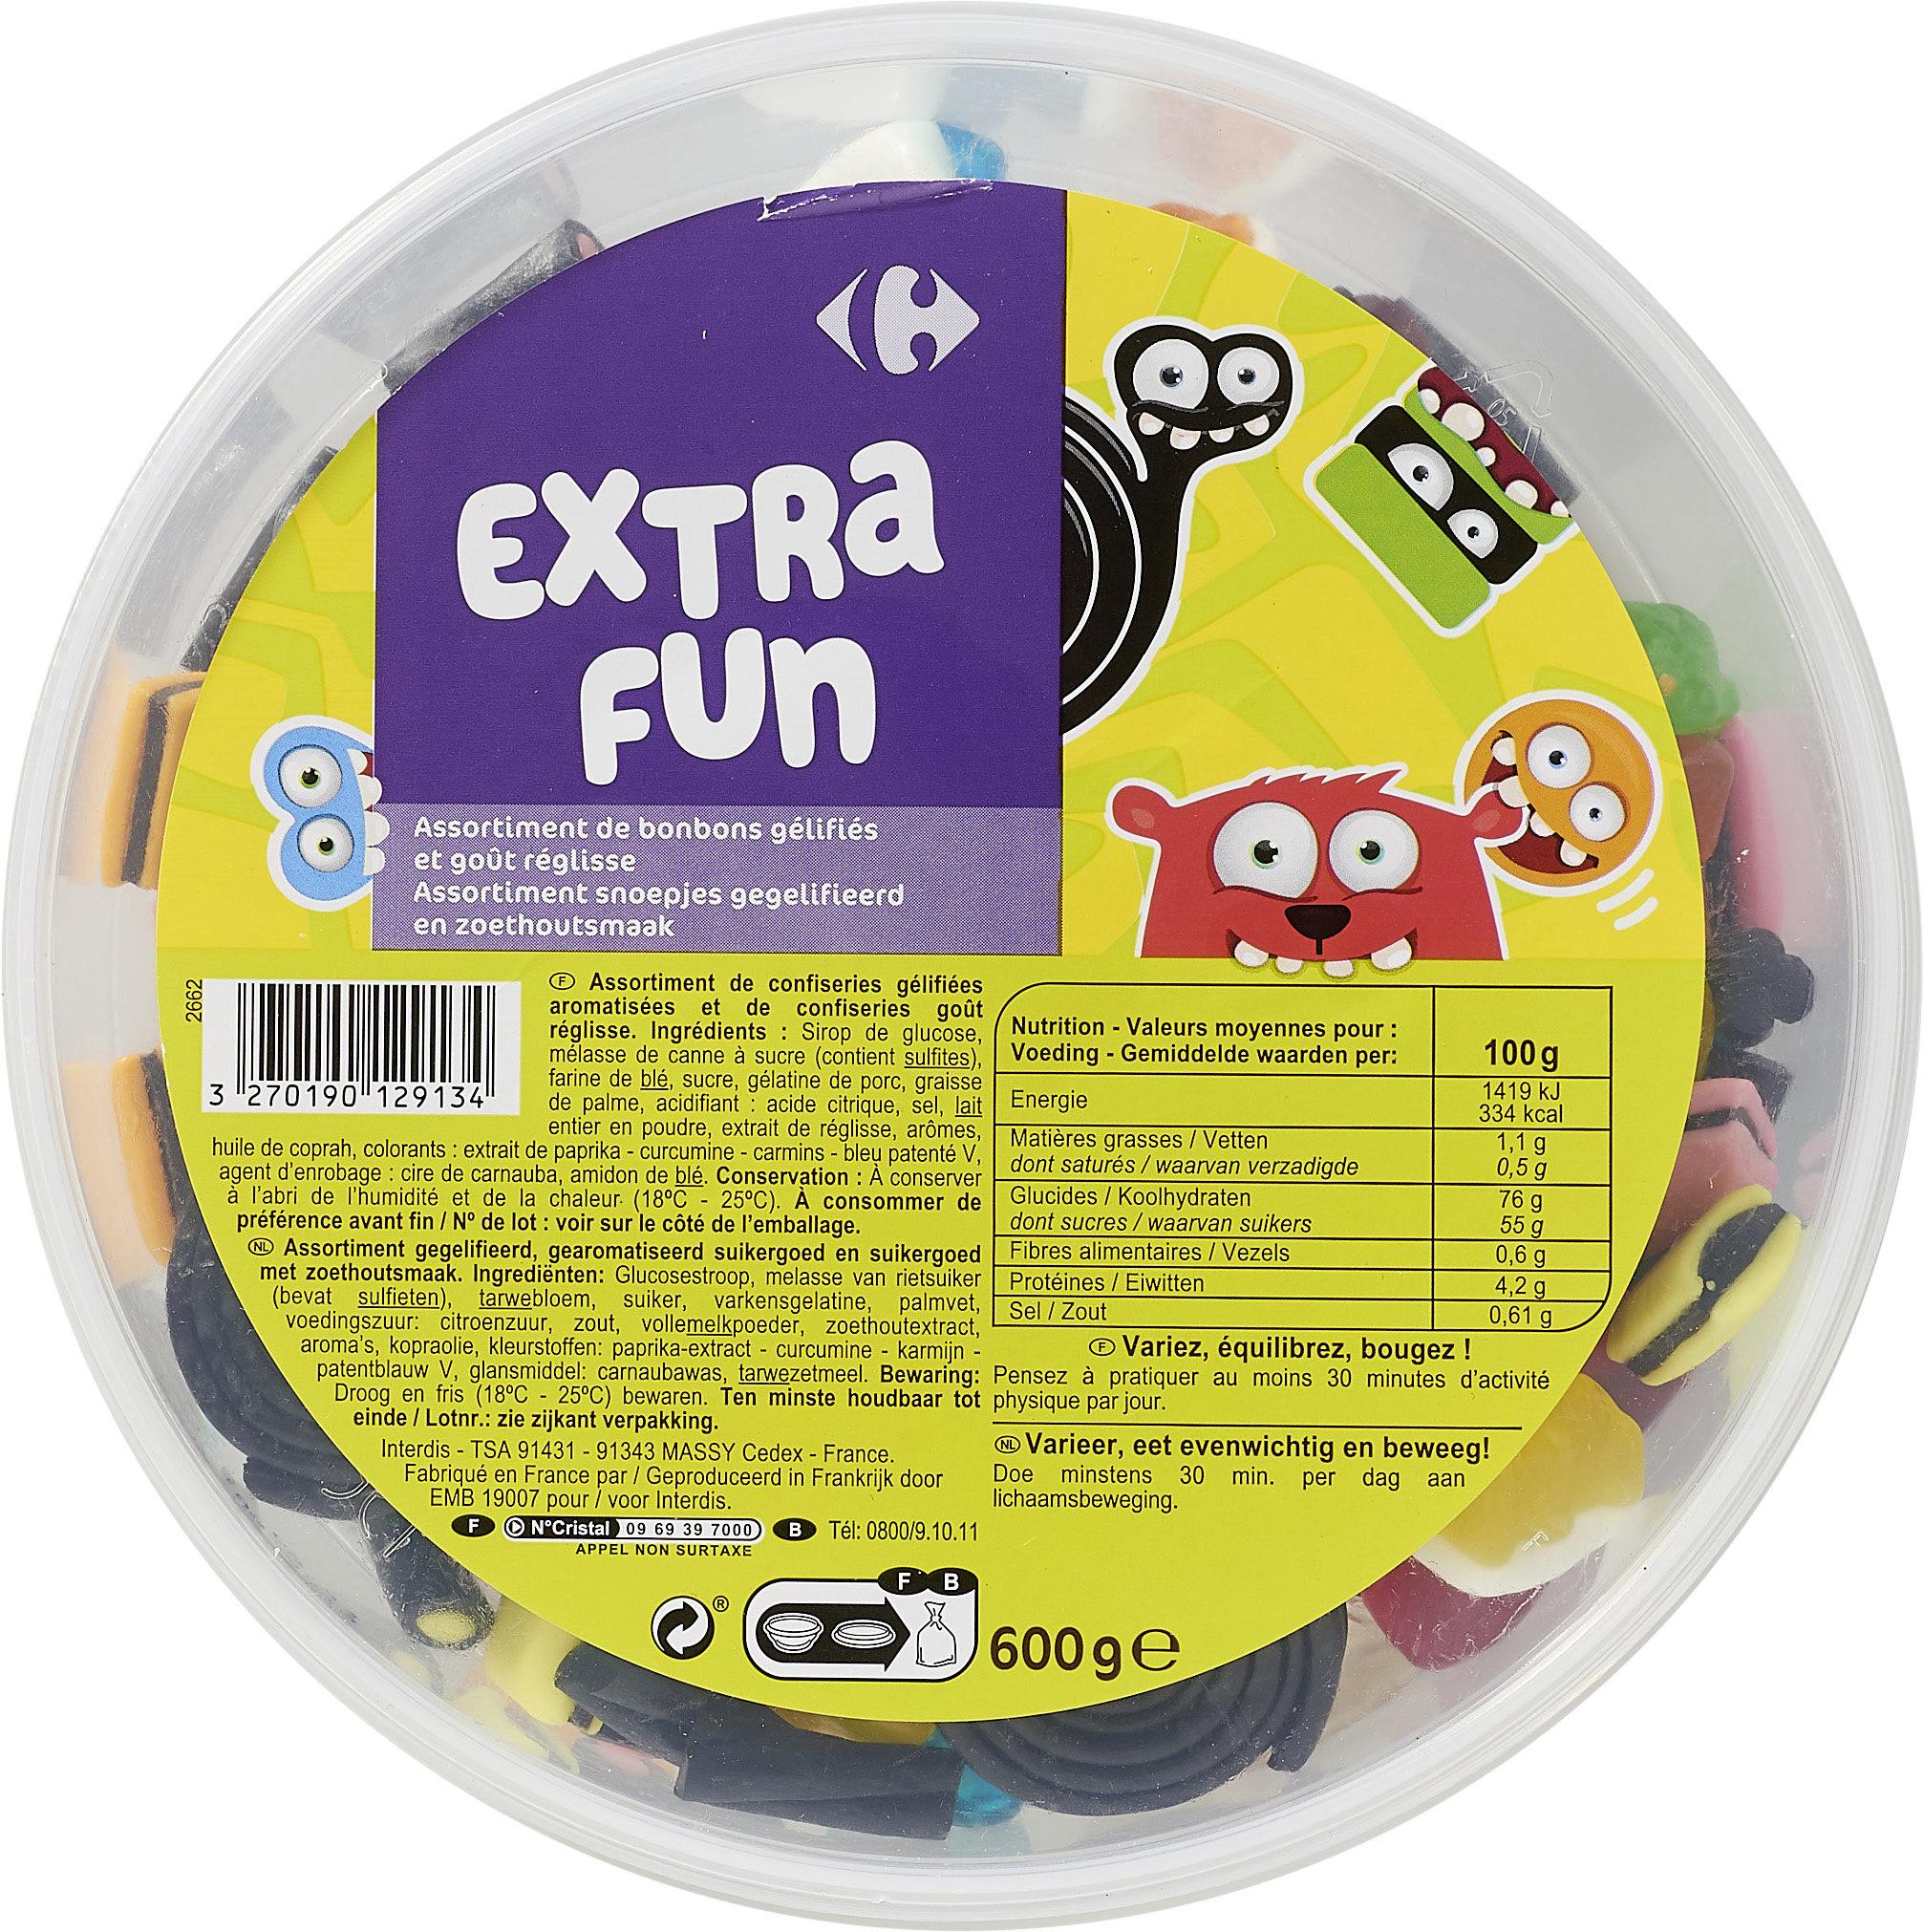 Extra fun - Product